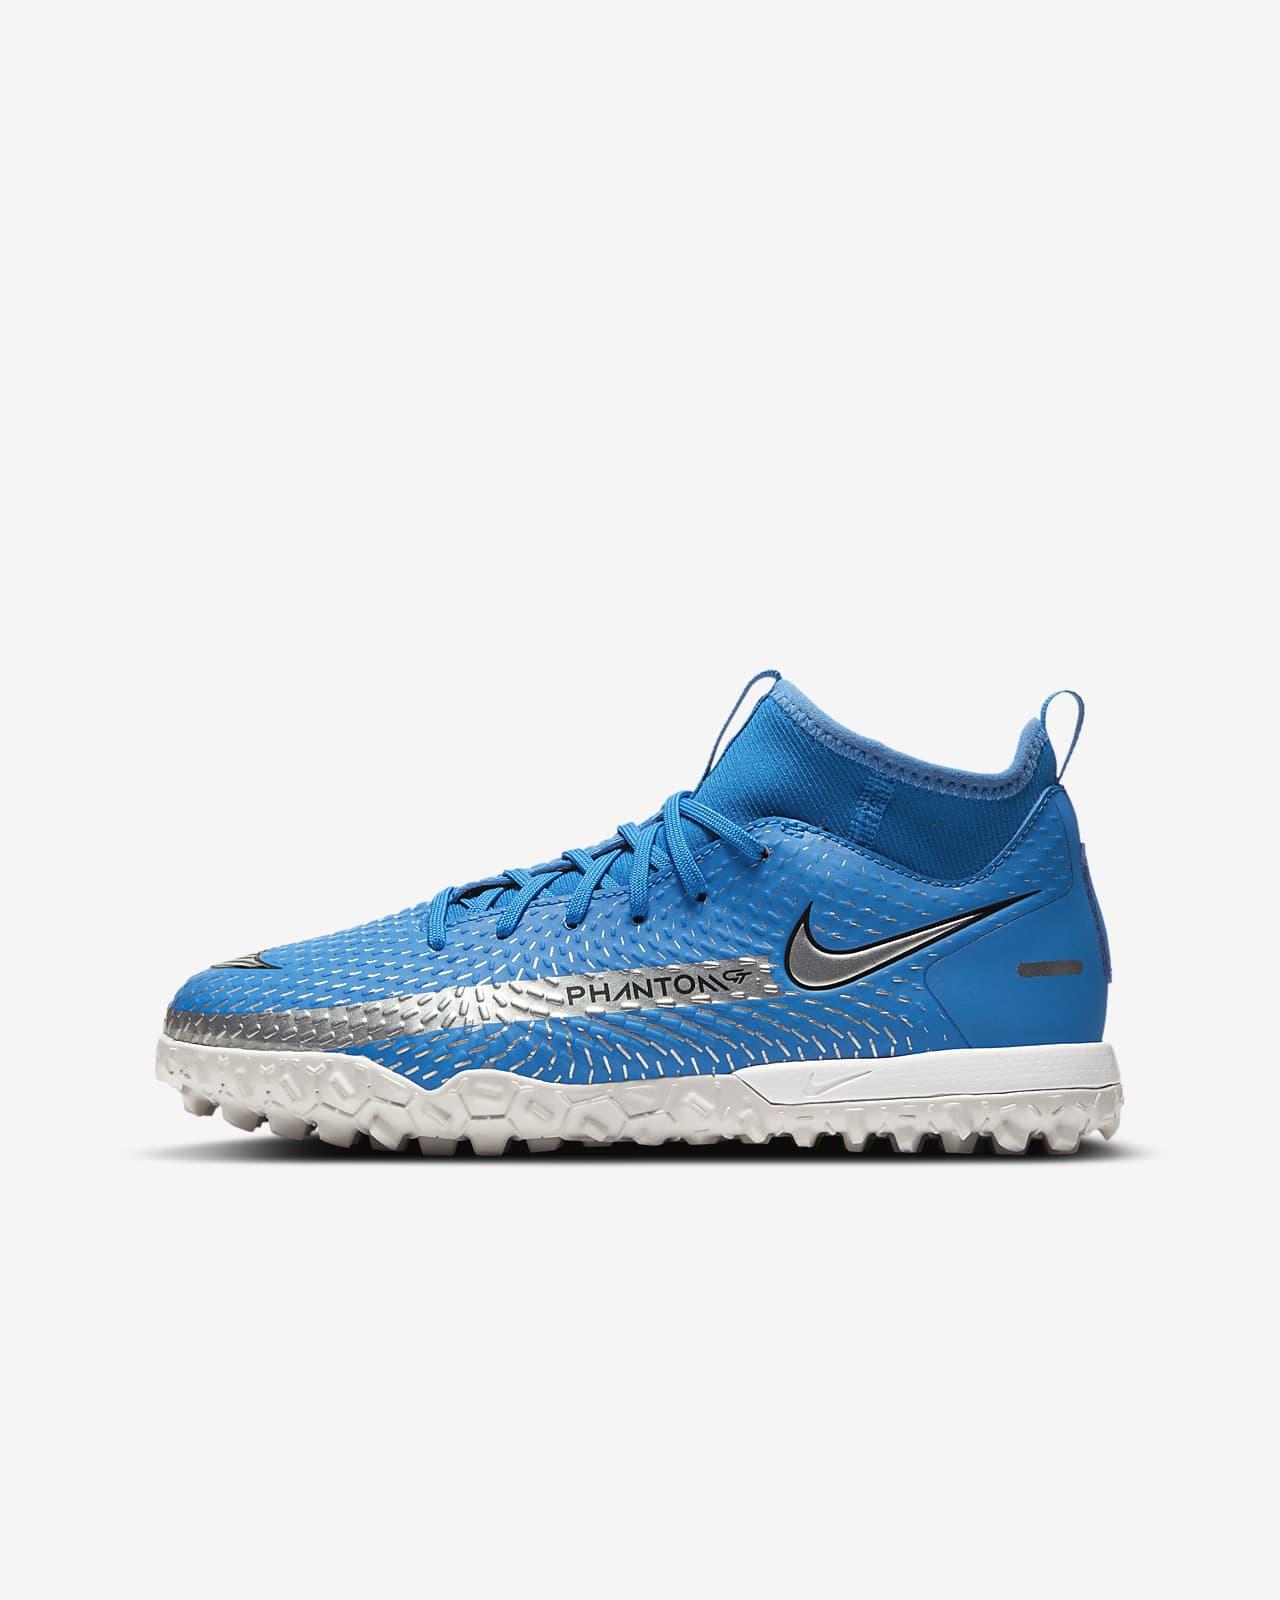 Nike Jr. Phantom GT Academy Dynamic Fit TF Younger/Older Kids' Artificial-Turf Football Shoe